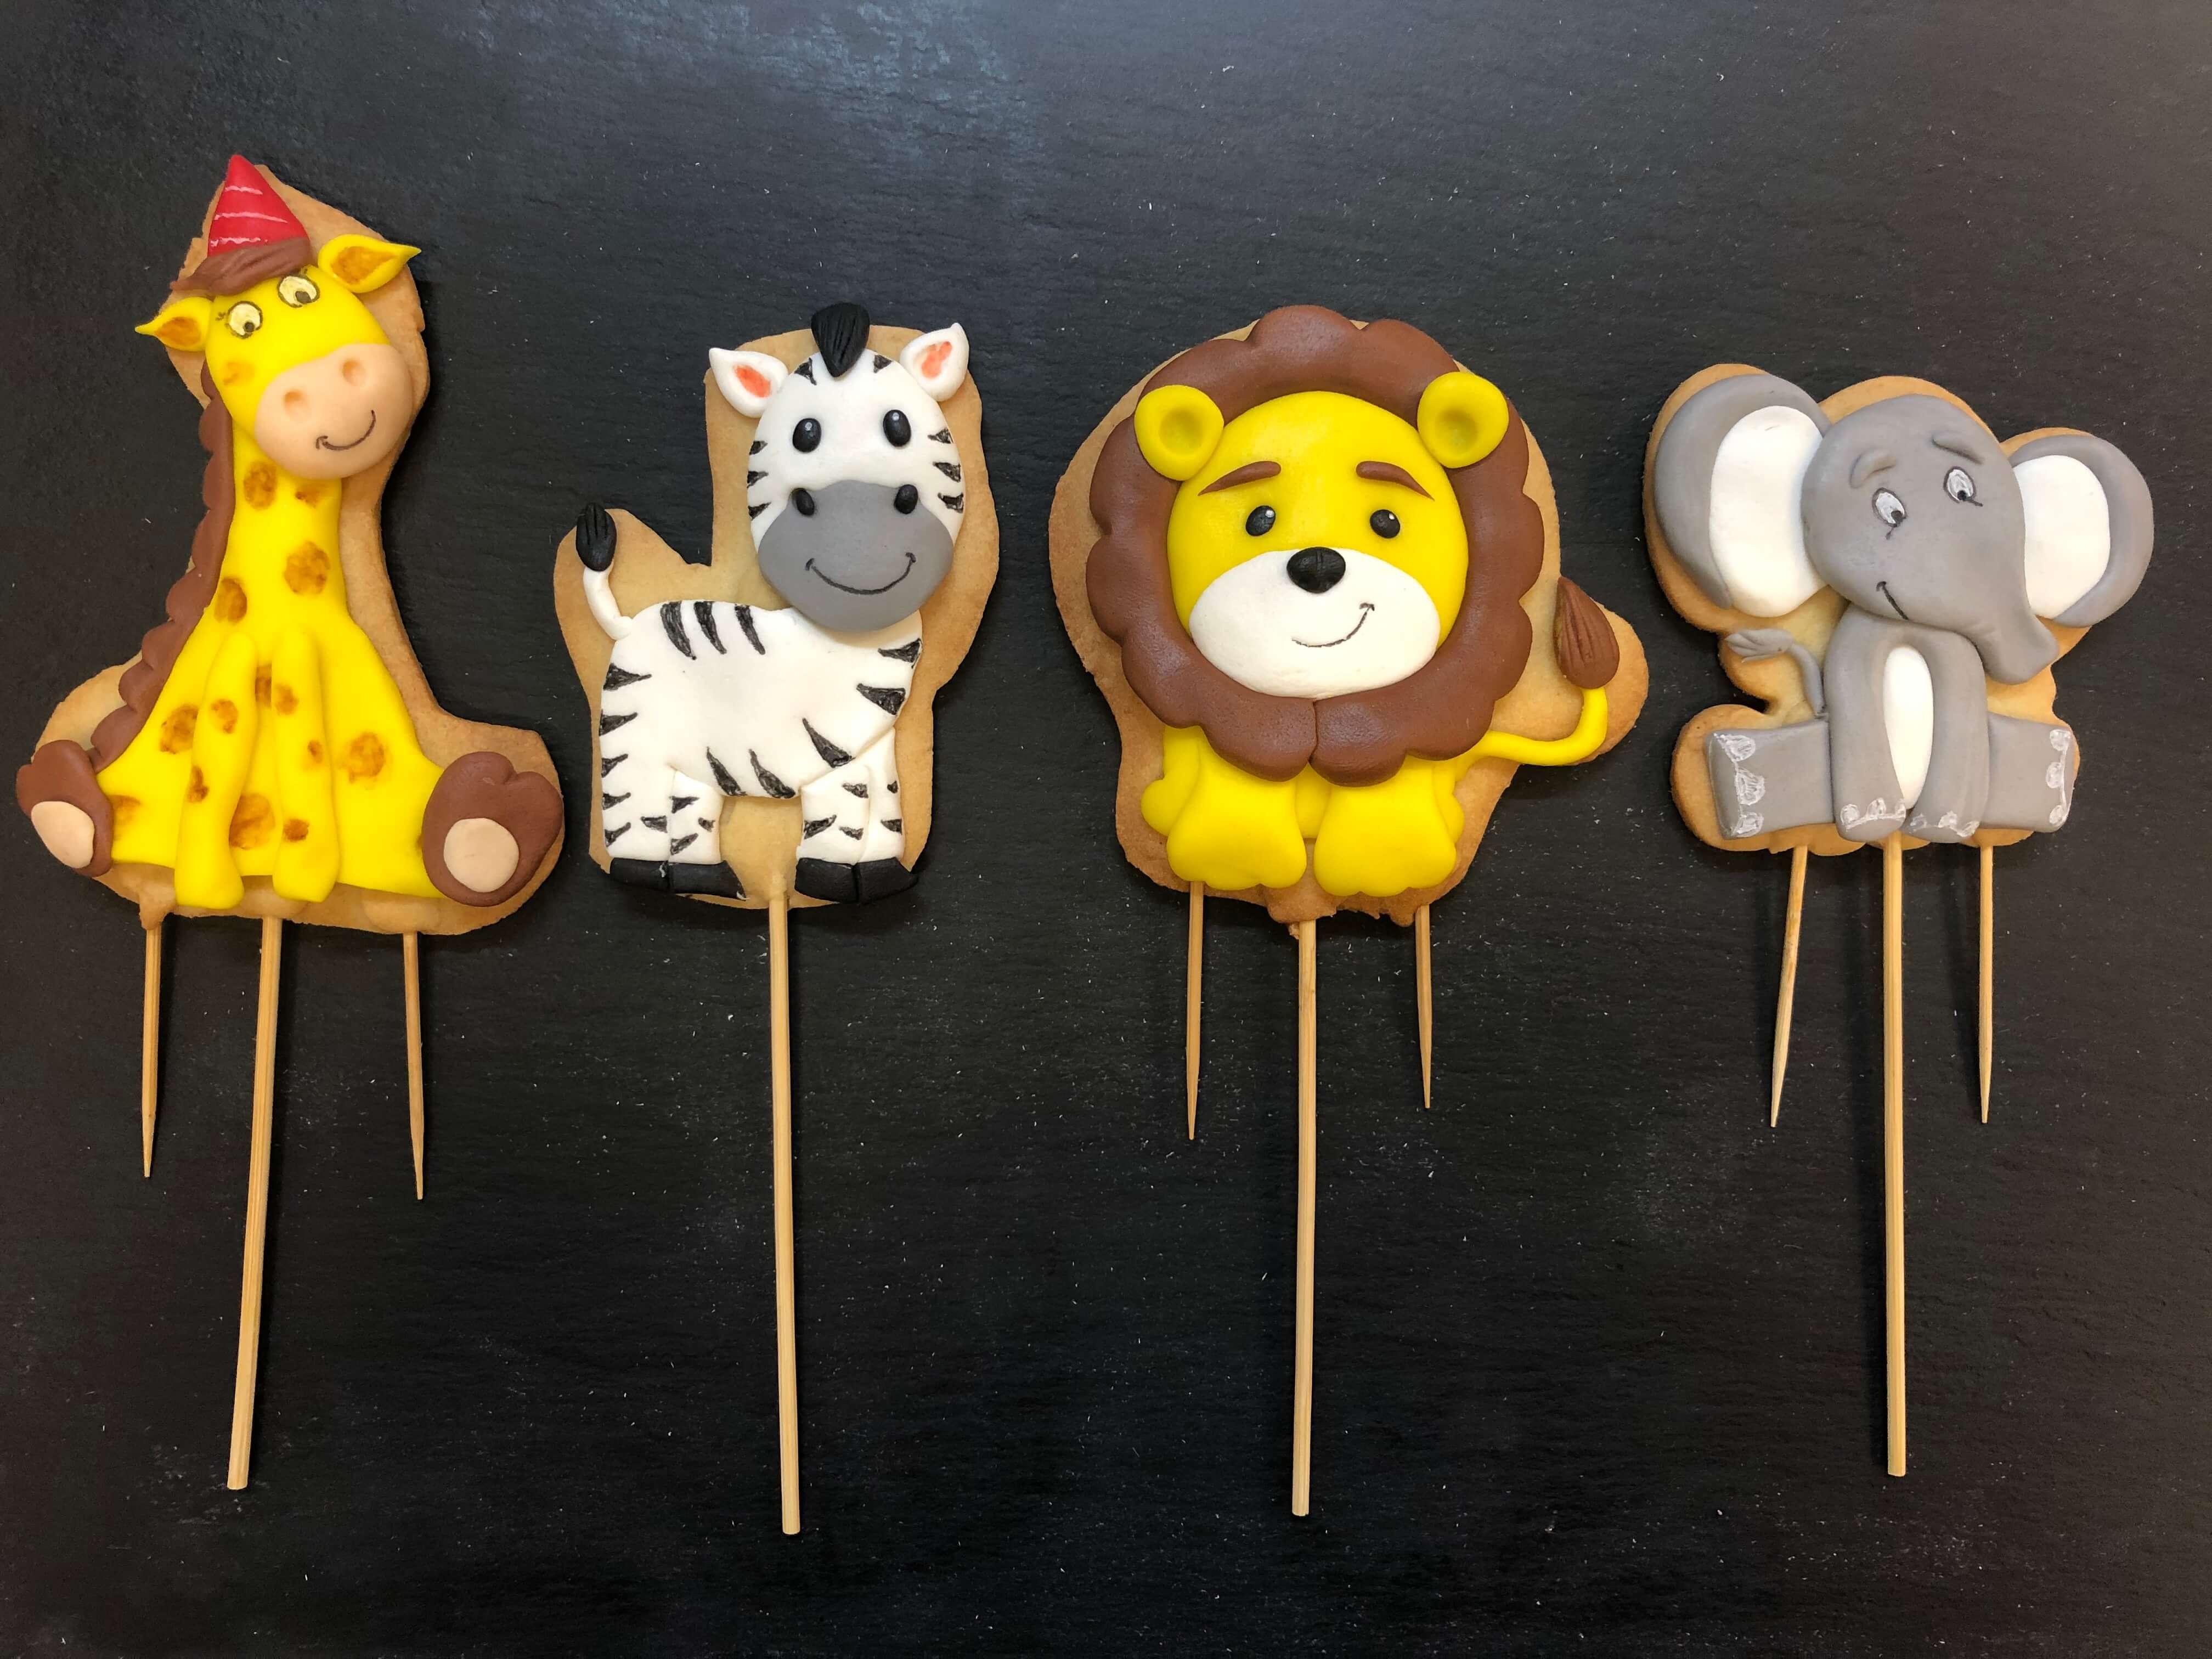 Galletas decoradas jirafa cebra león elefante coruña